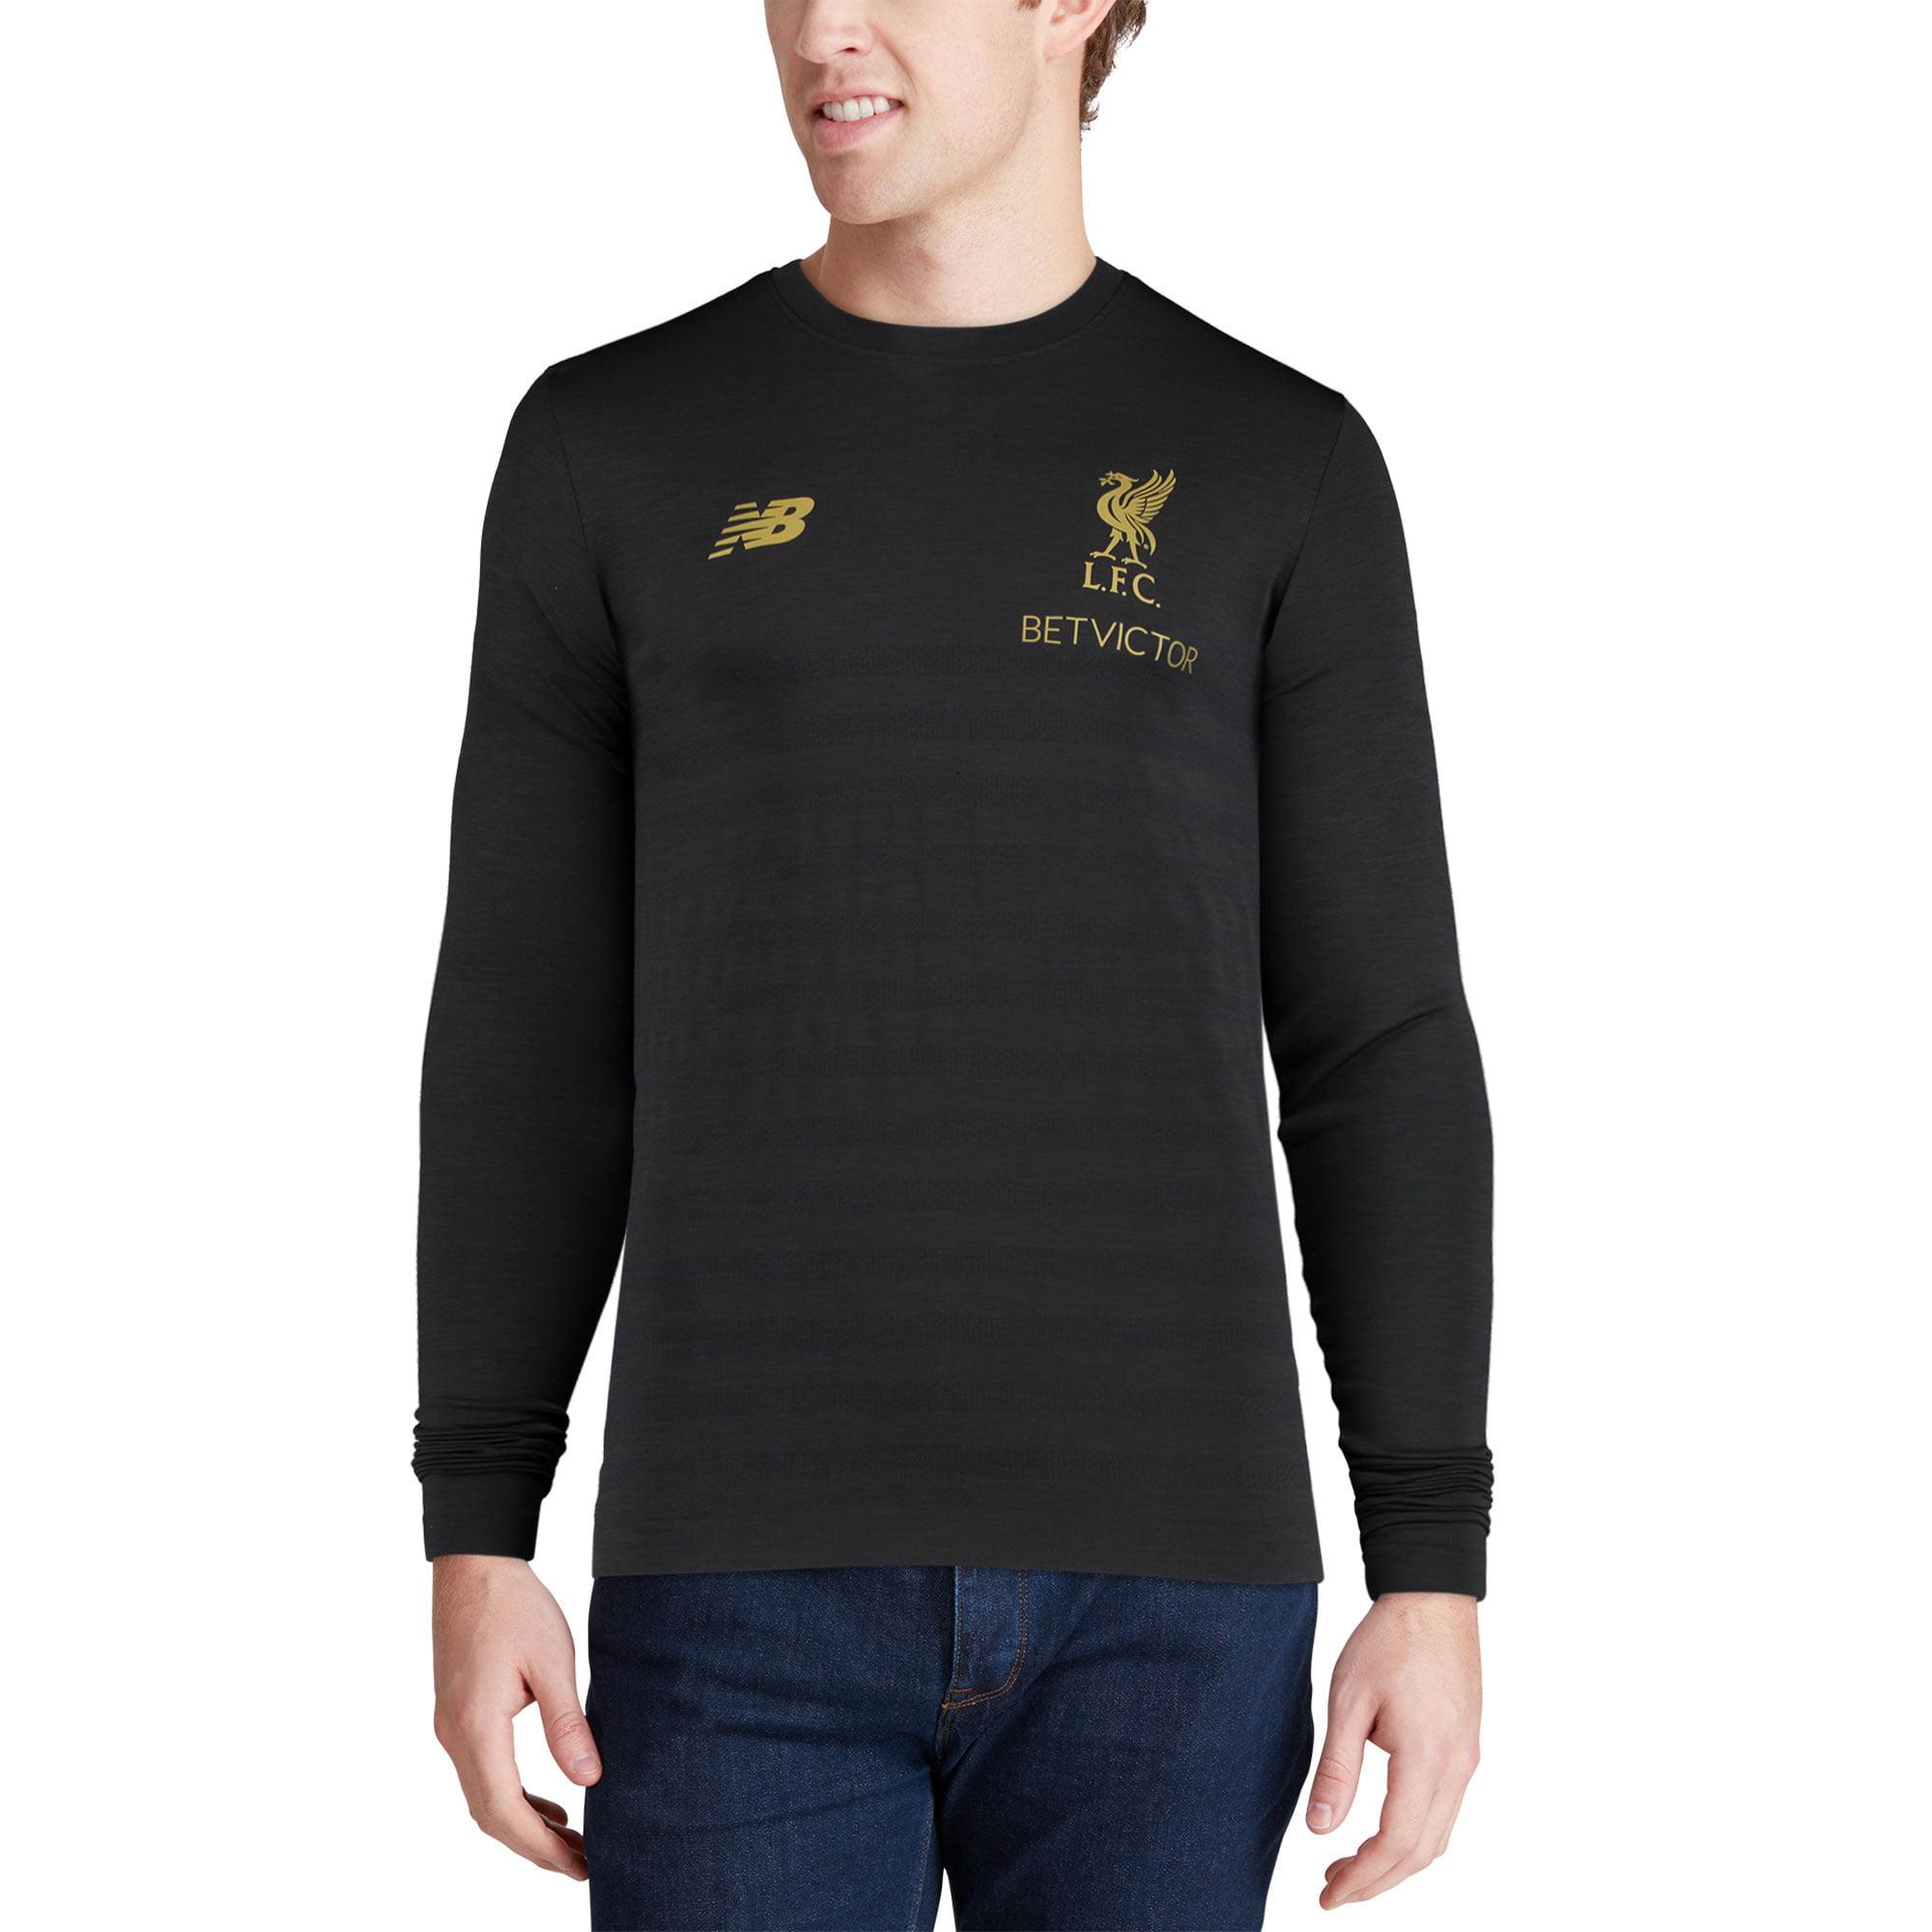 19bdfcac58698 New Balance - Liverpool New Balance Manager's Collection Seamless NB Dry  Long Sleeve T-Shirt - Gray - Walmart.com